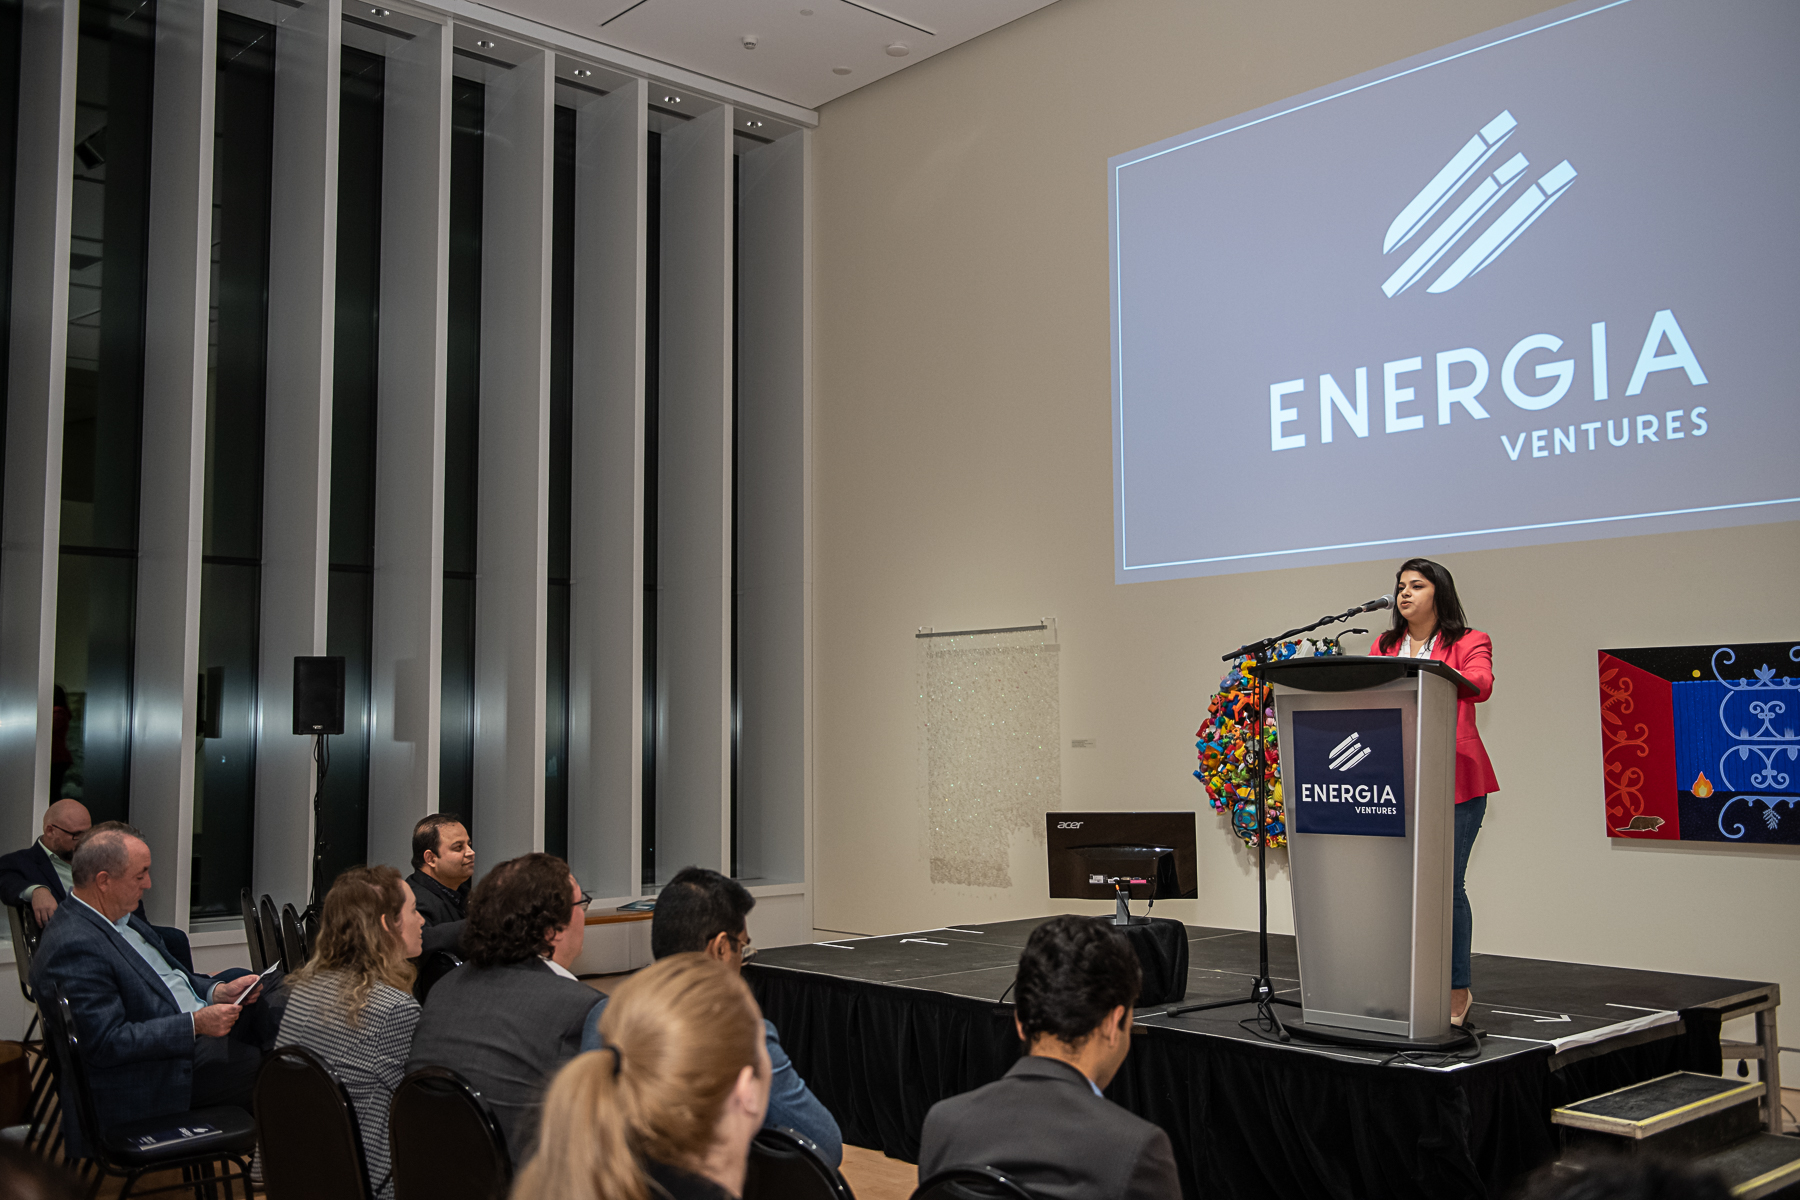 201911_energia_0042